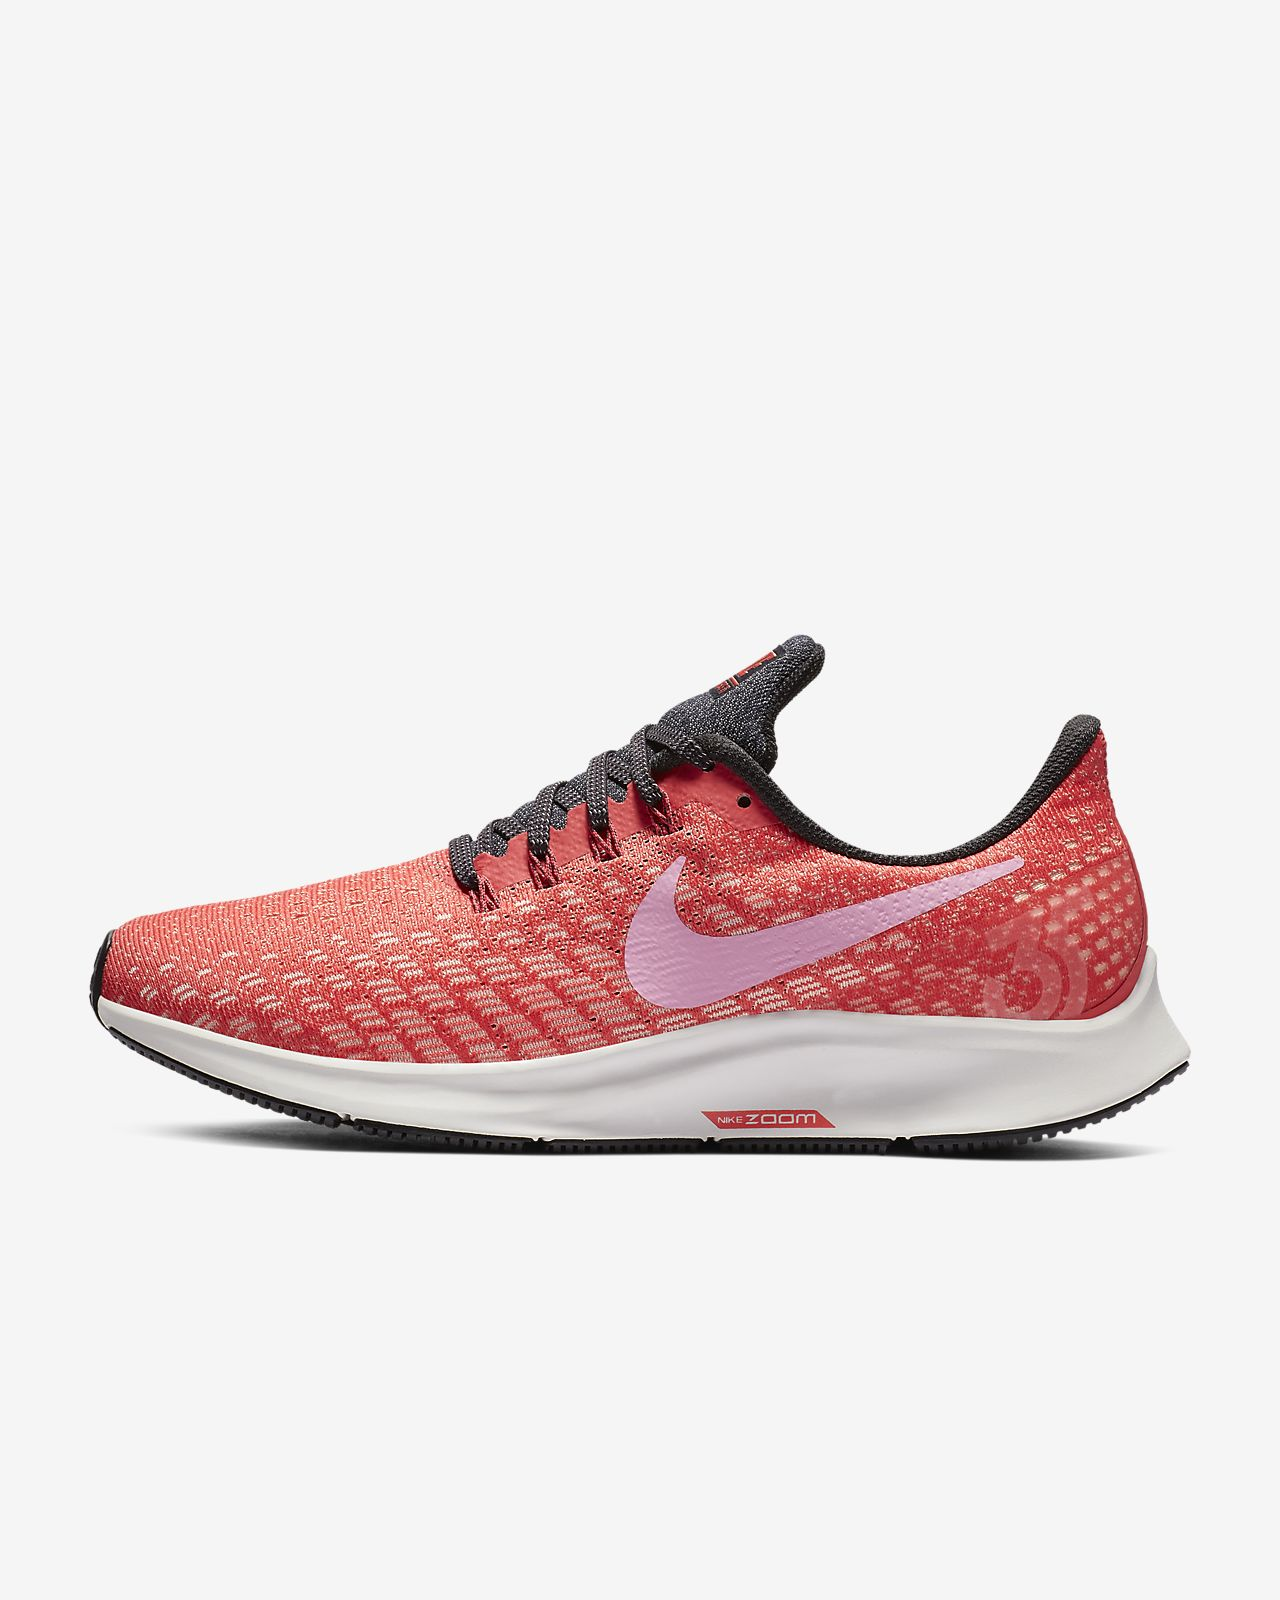 ae0eee3fd7b Nike Air Zoom Pegasus 35 Zapatillas de running - Mujer. Nike.com ES